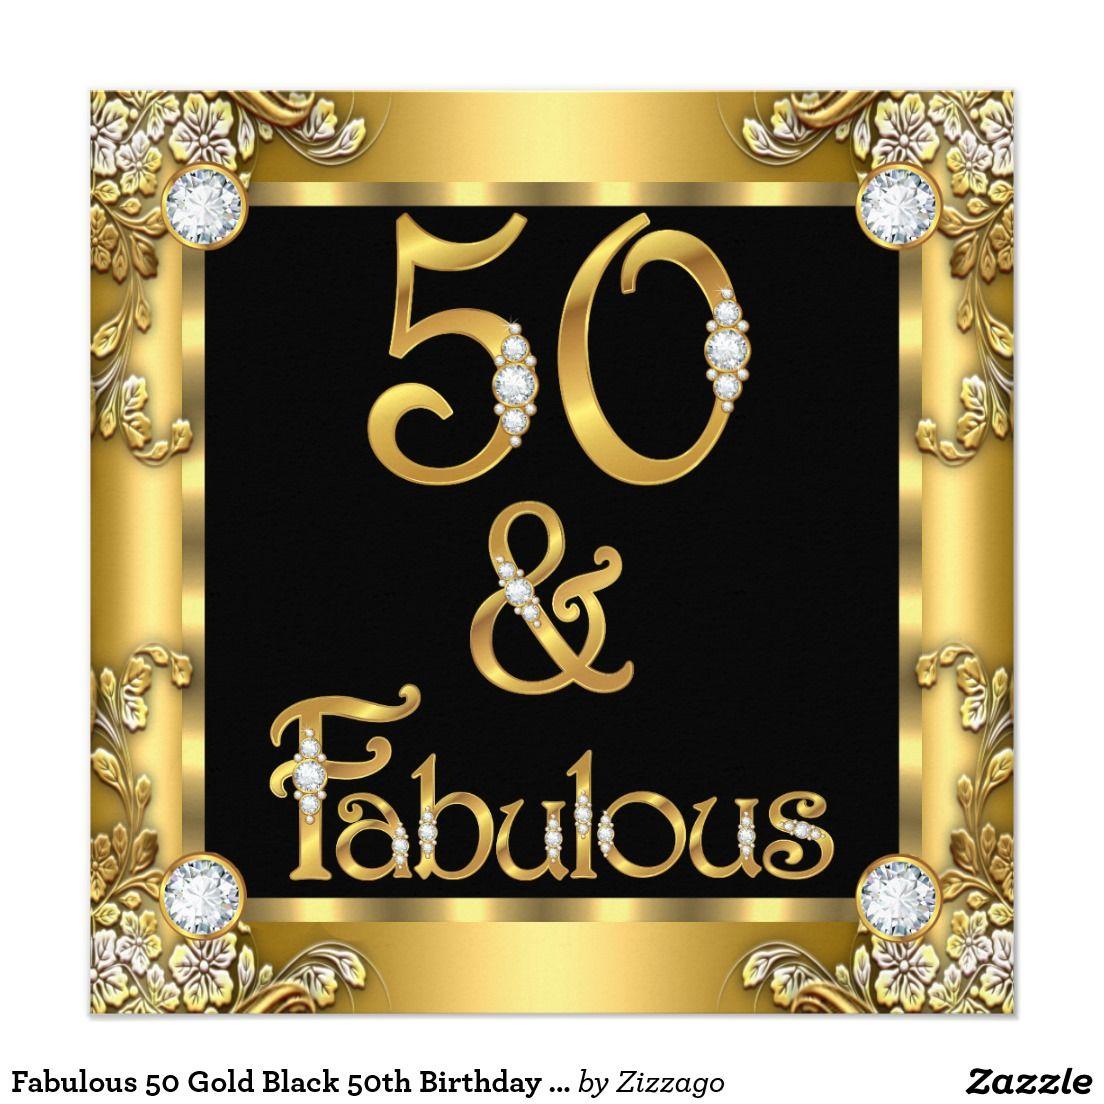 Fabulous 50 Gold Black 50th Birthday Party Invitation